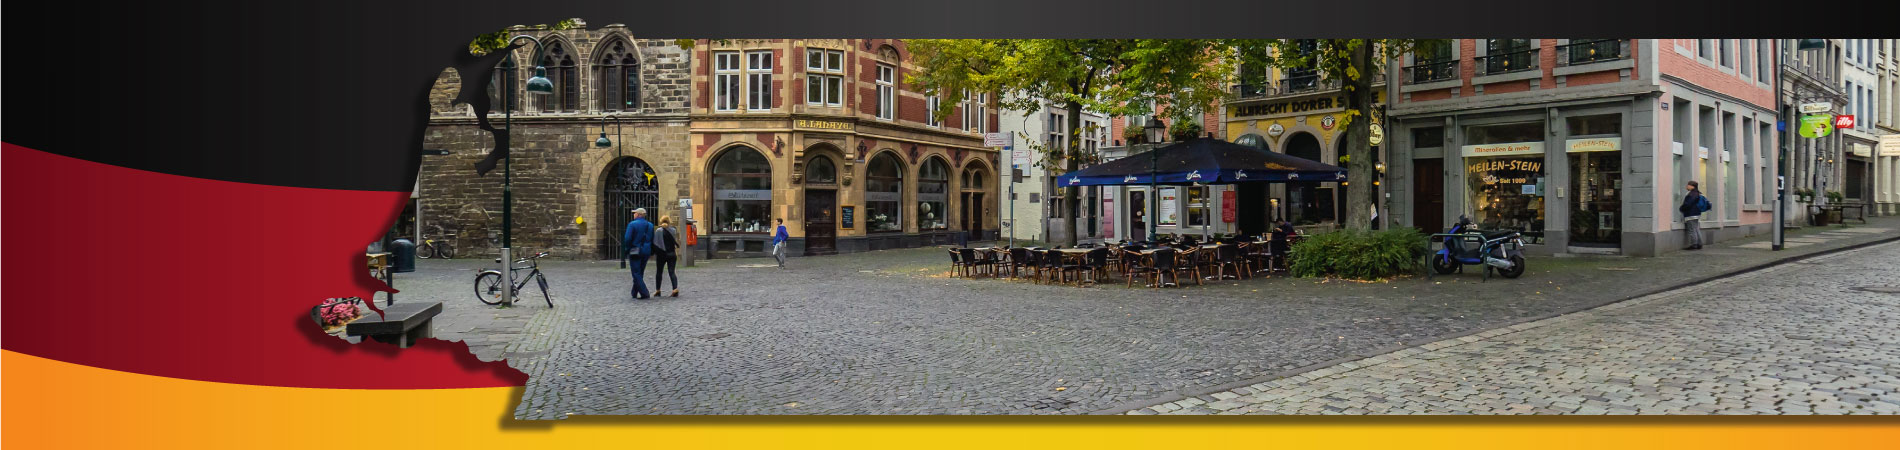 Grashaus Aachen tours